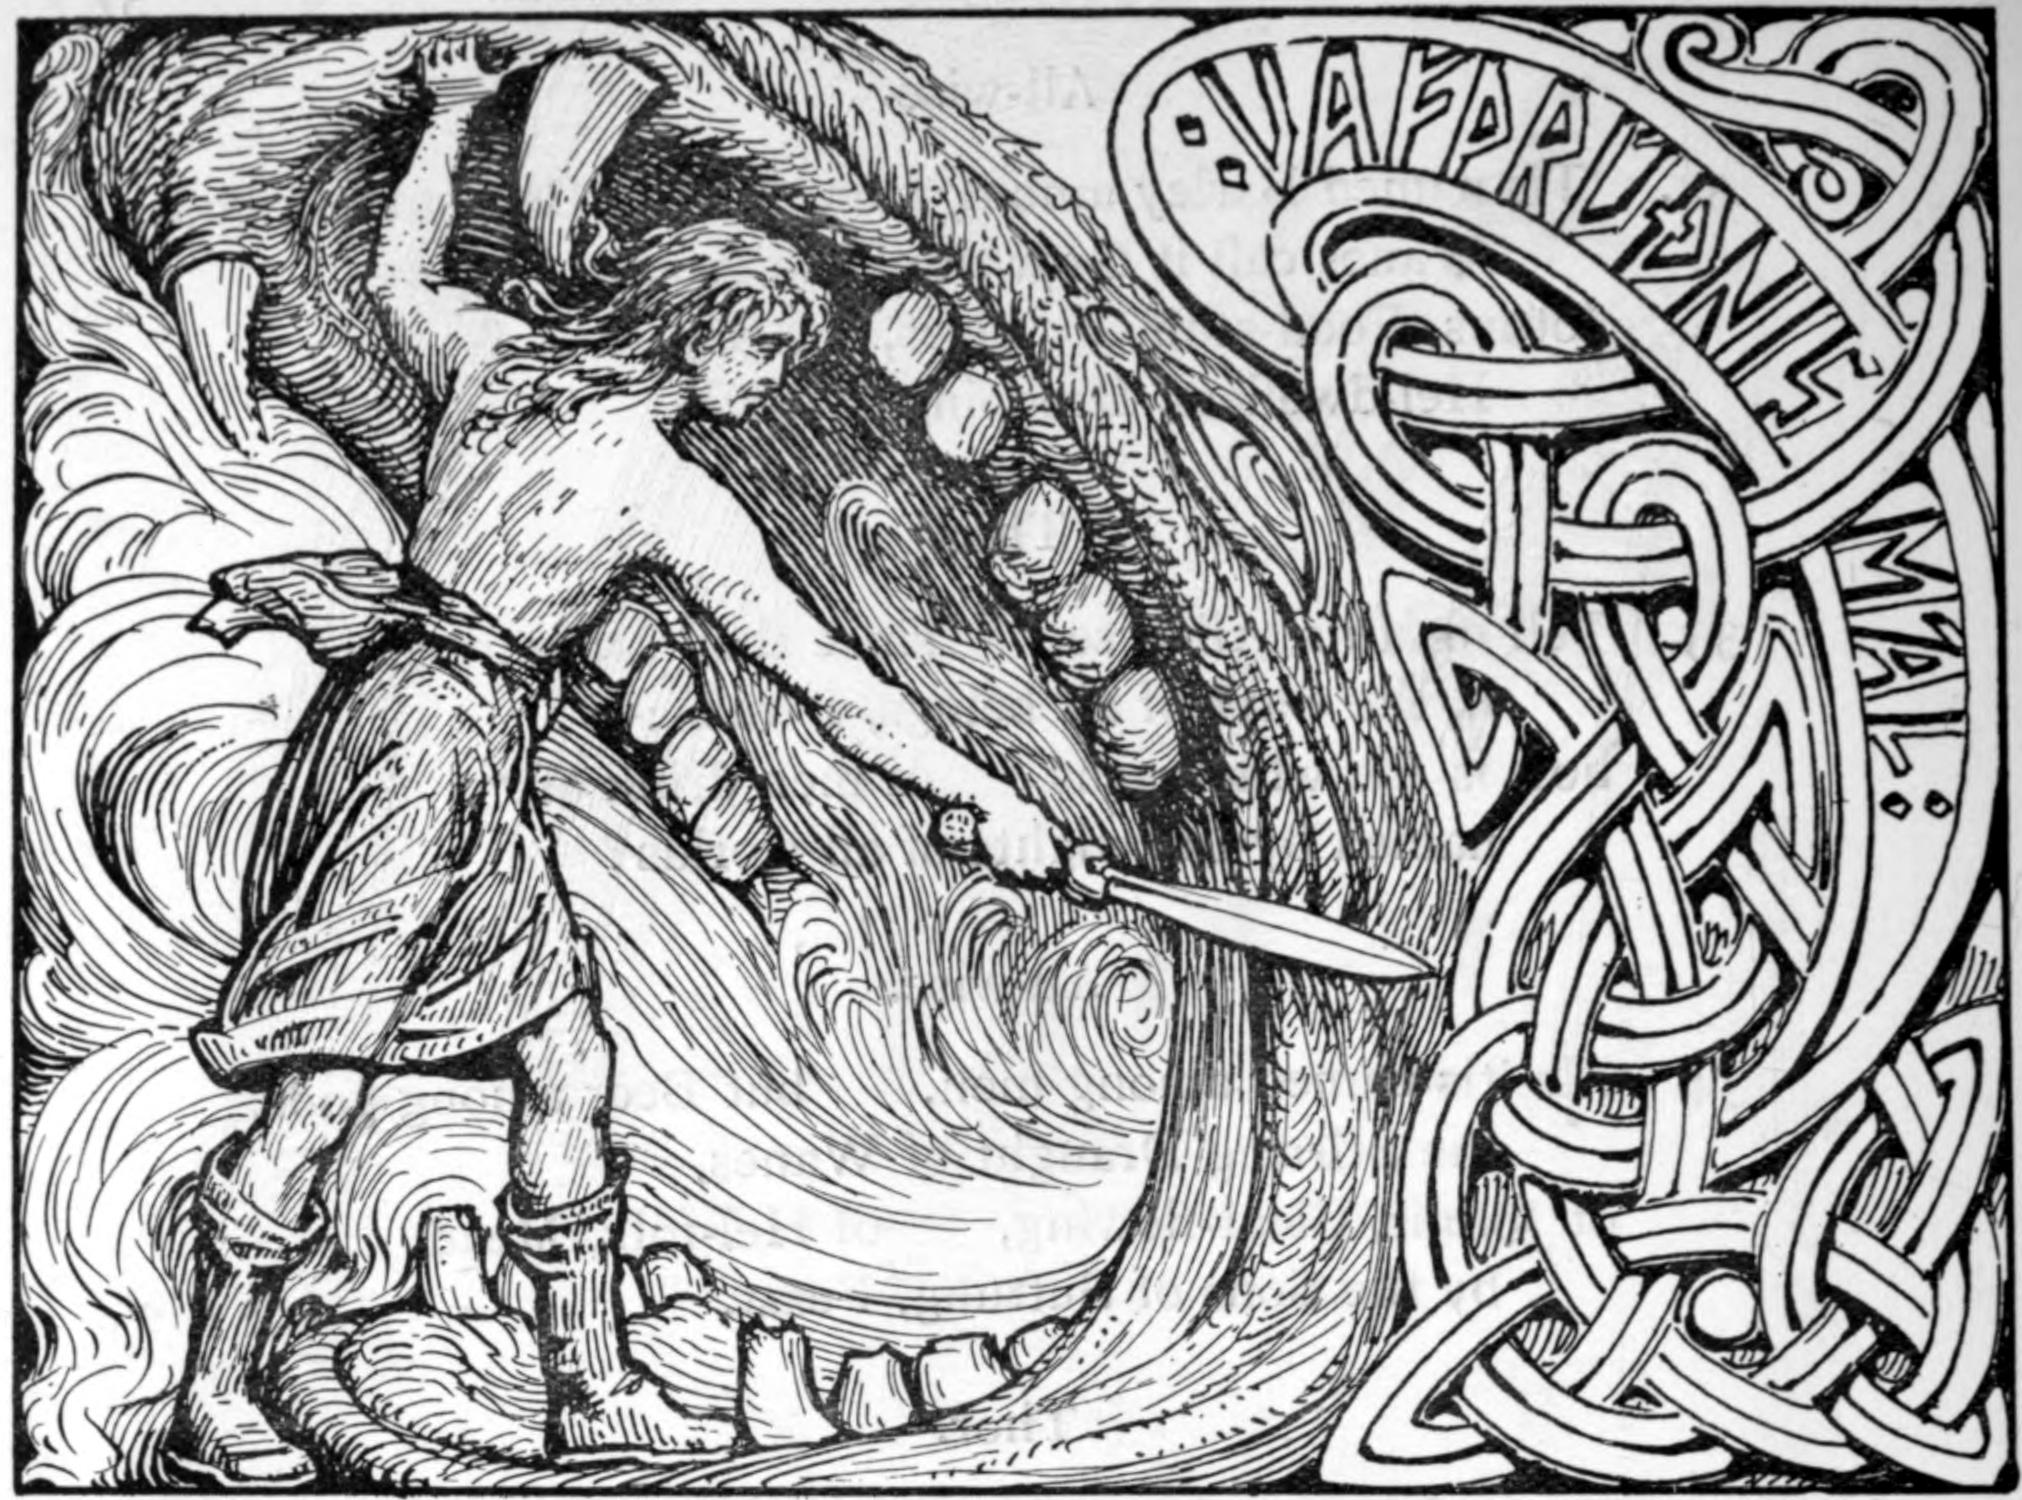 matthew morgera comparing norse and greek mythology